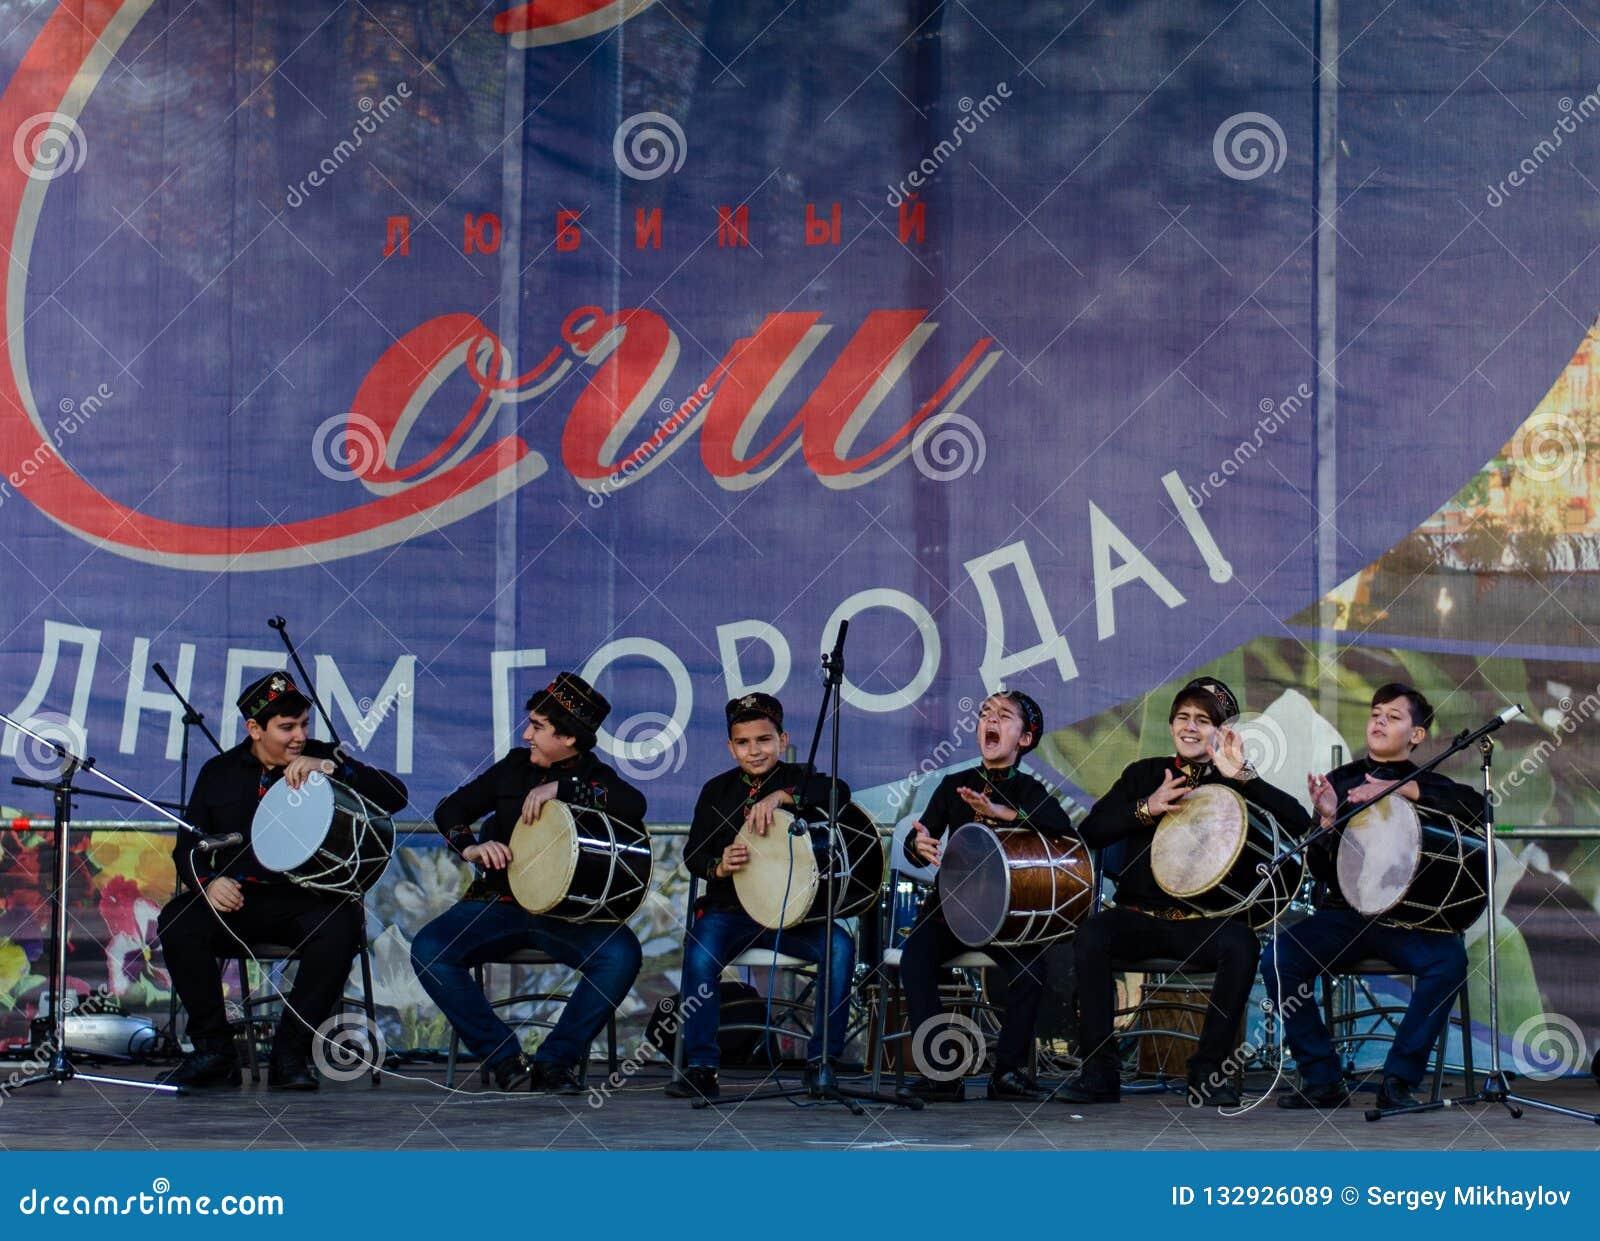 Sochi Ρωσία - 24 Νοεμβρίου 2018: απόδοση της δημιουργικής ομάδας στο φεστιβάλ που αφιερώνεται στην ημέρα της πόλης του Sochi